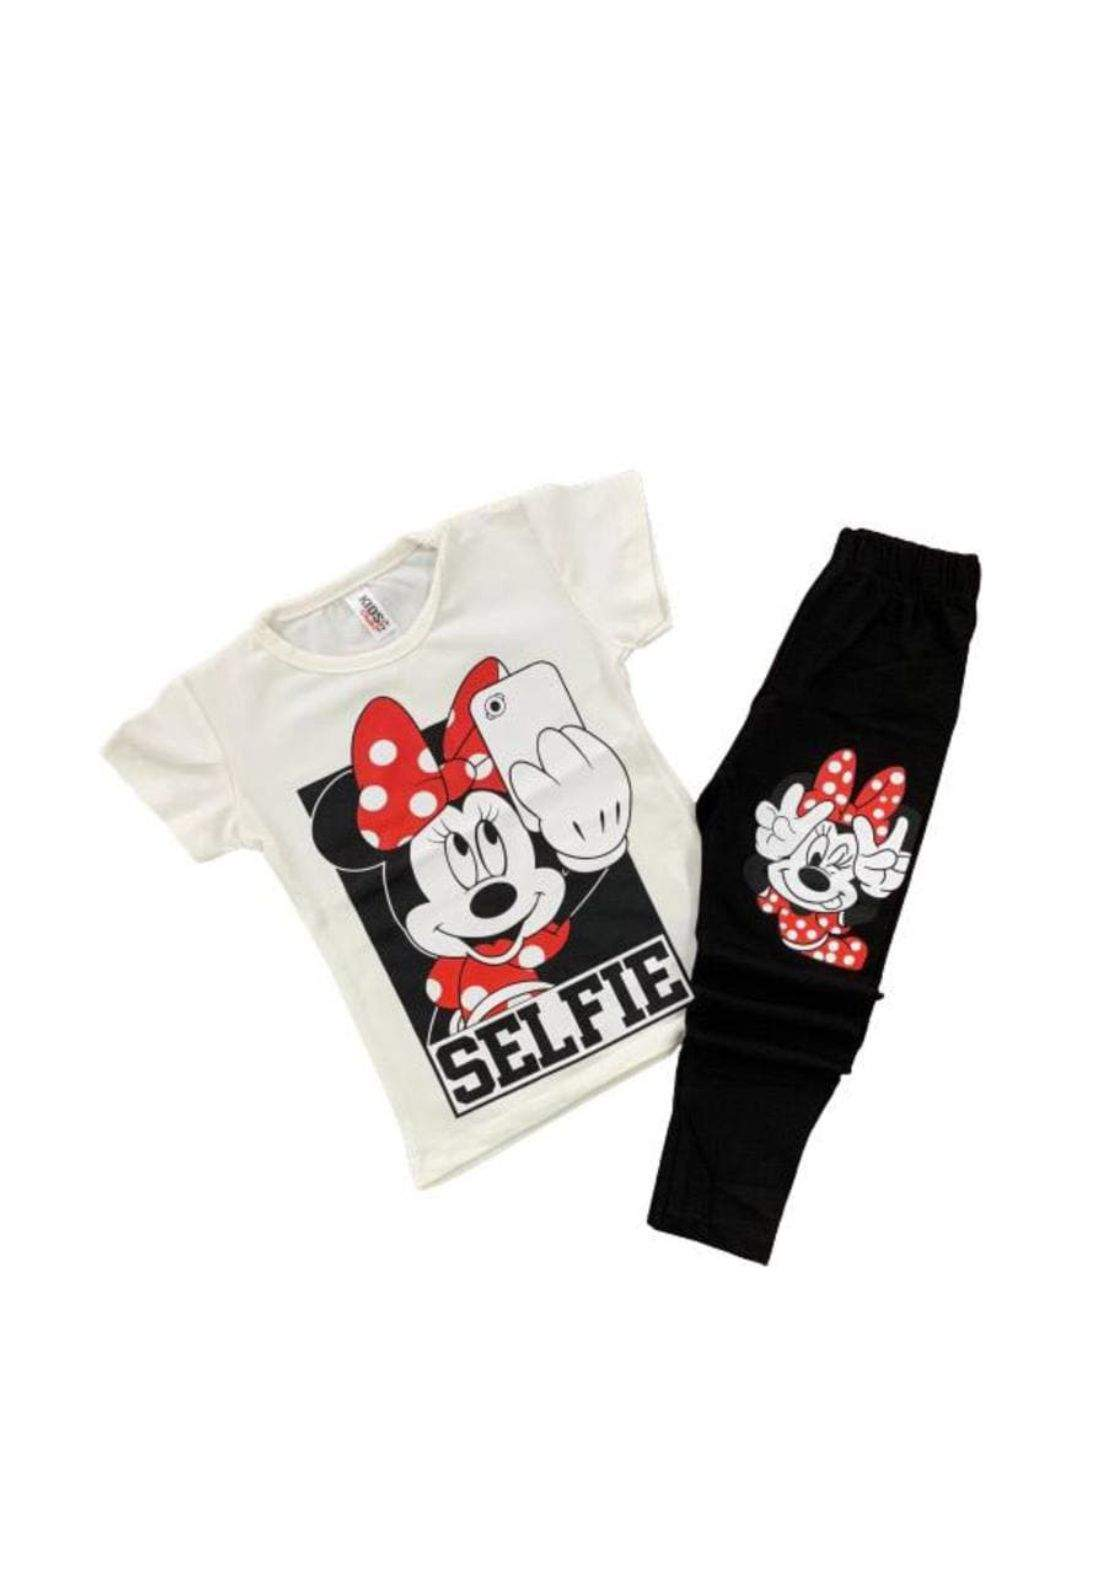 tracksuit for girls white  (t-shirt+ Pijamas ) ( تراكسوت بناتي ابيض   (شورت وبجامة